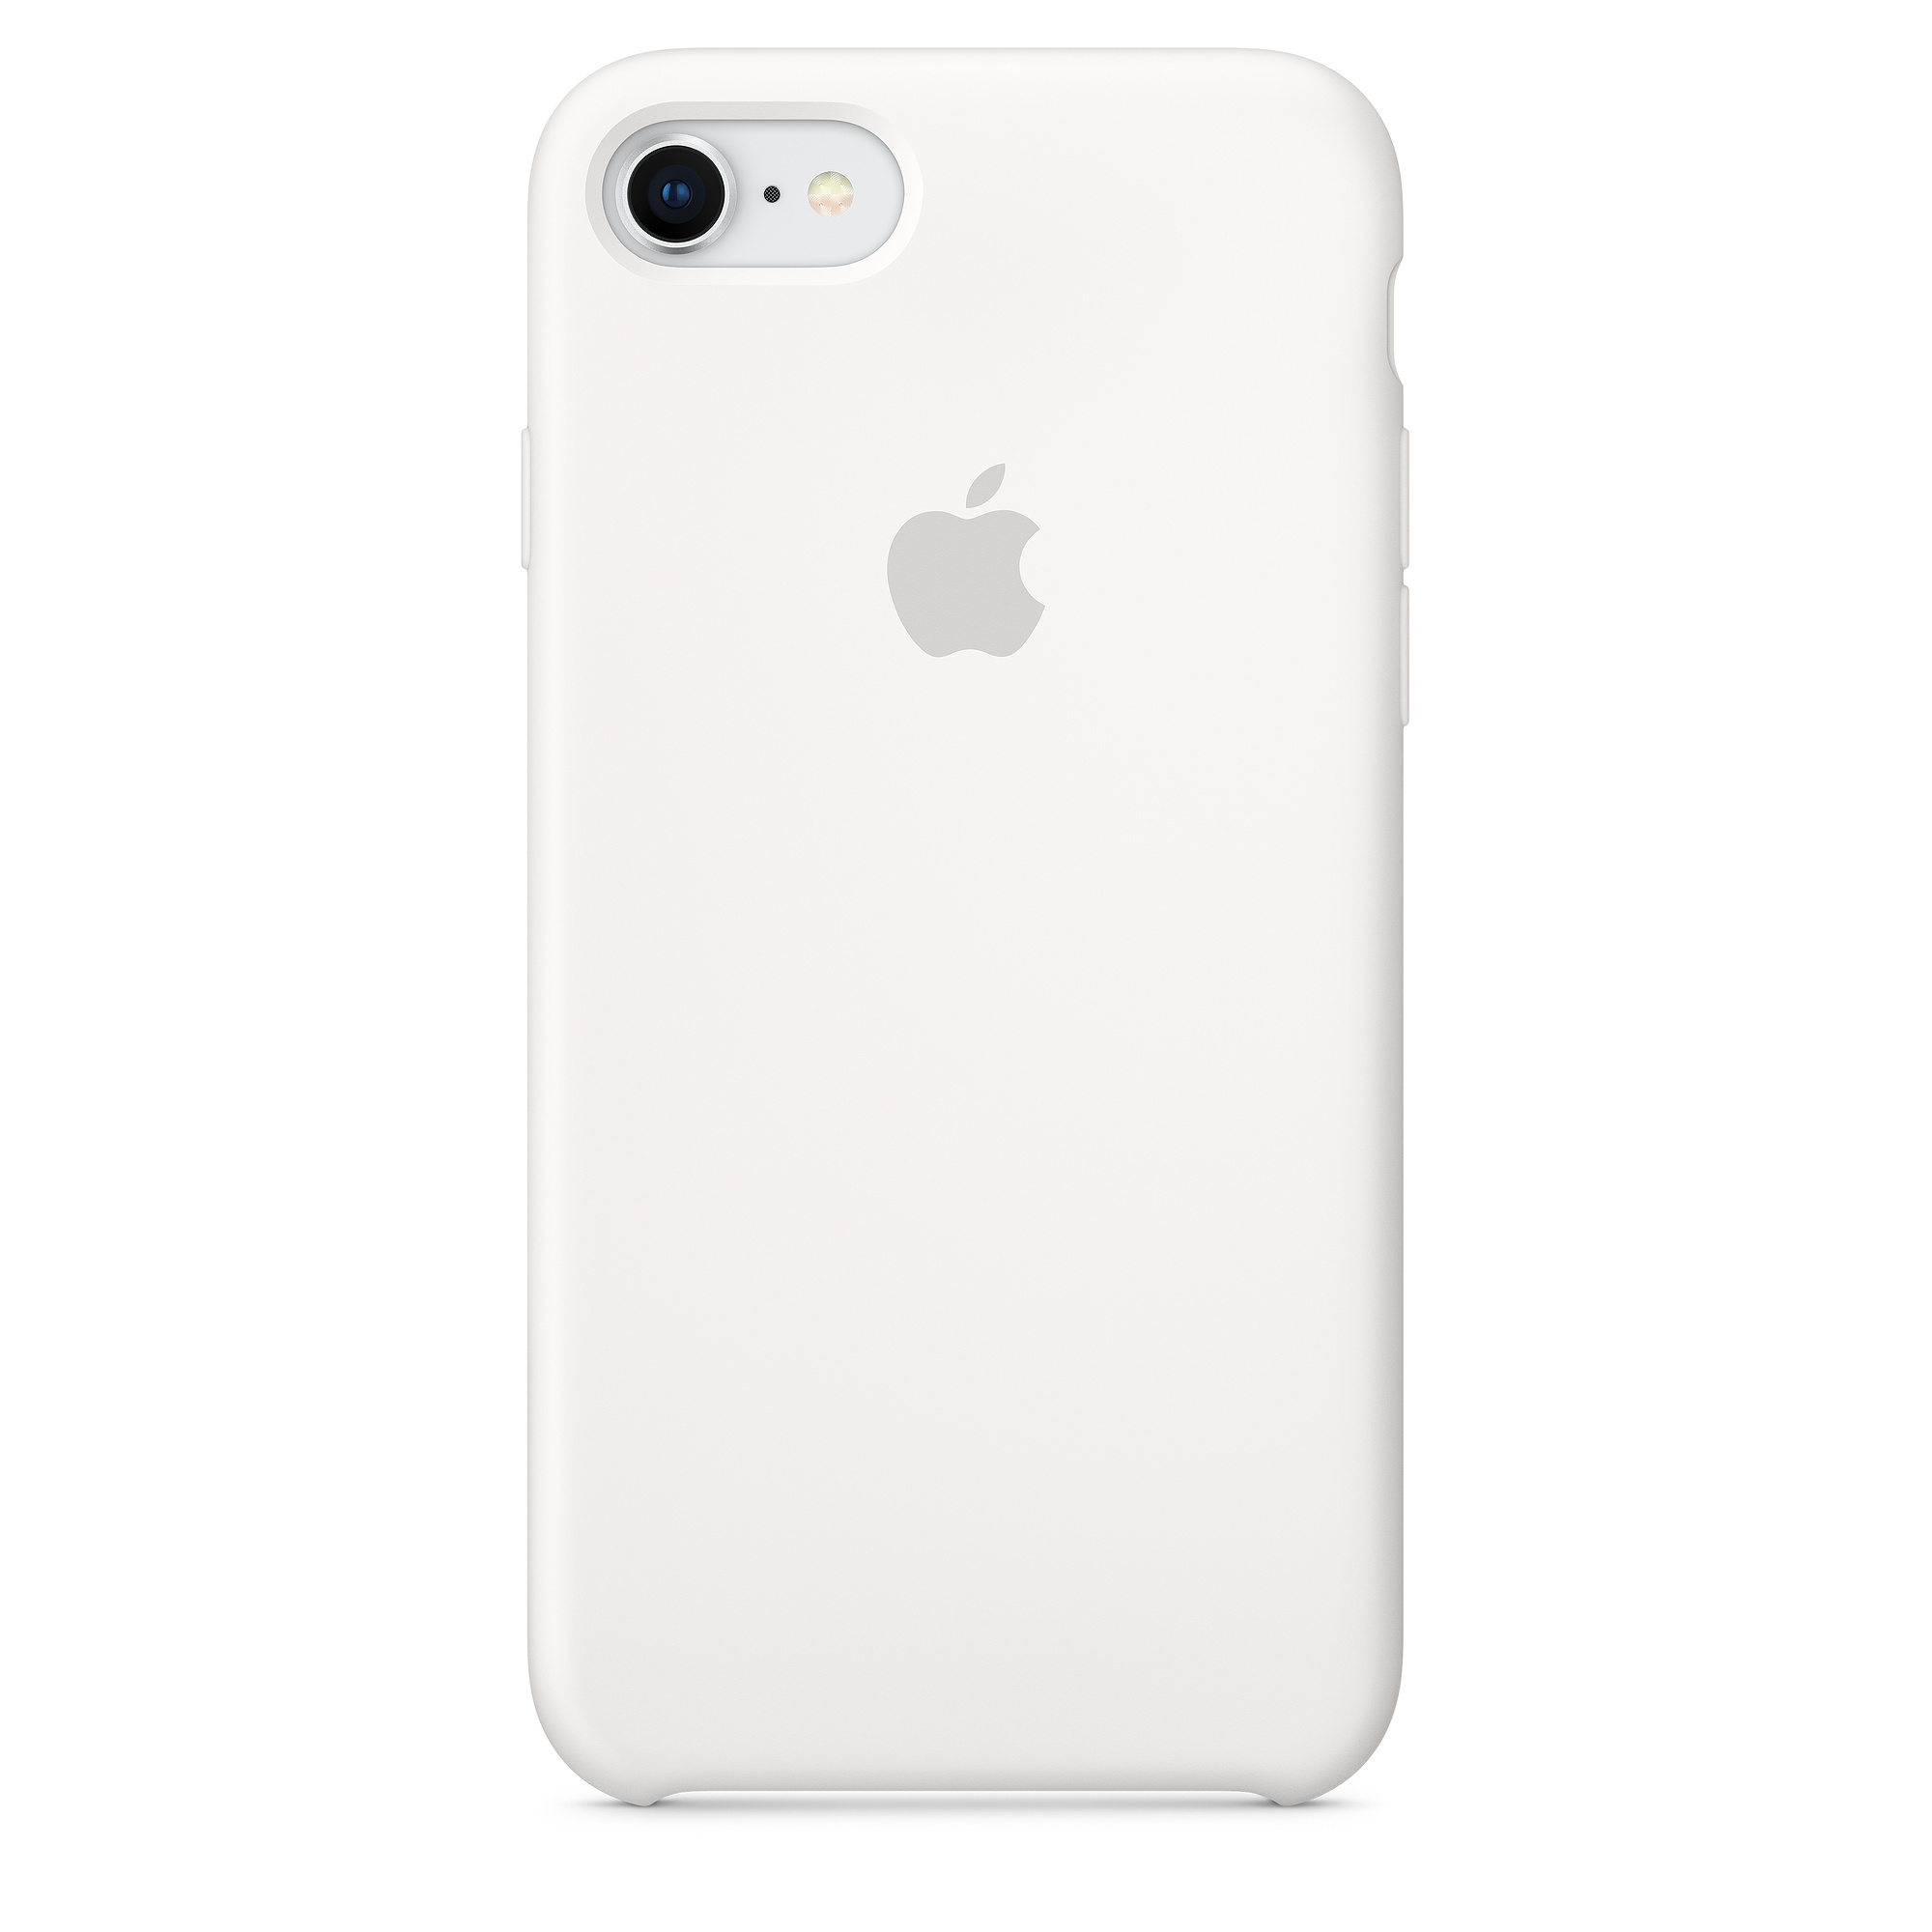 Apple silikónový obal pre iPhone SE 2020 – biely 1